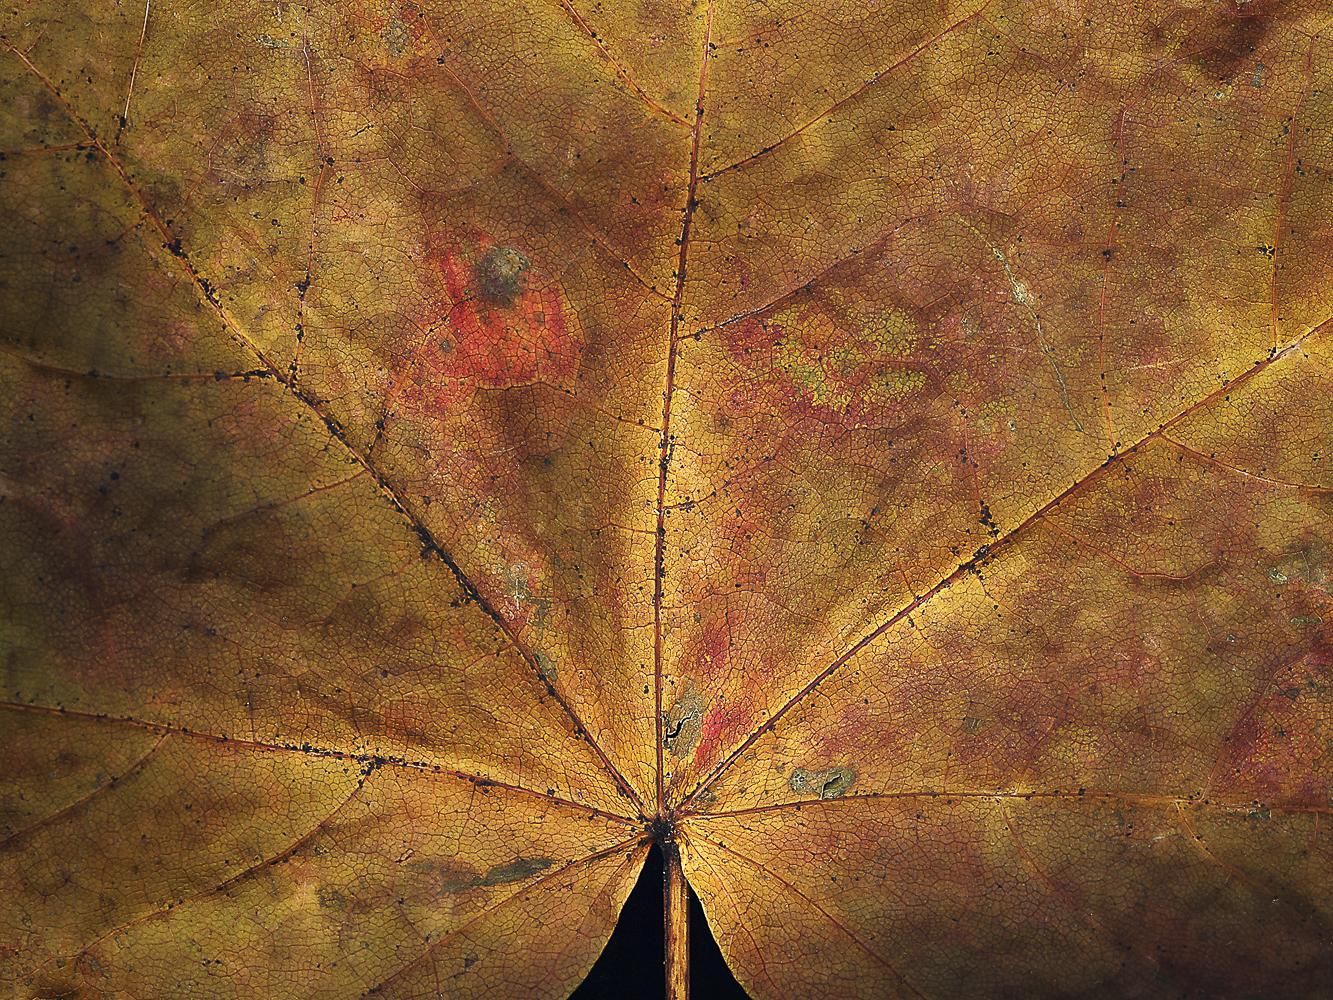 sycamore-leaf-(1-of-1).jpg